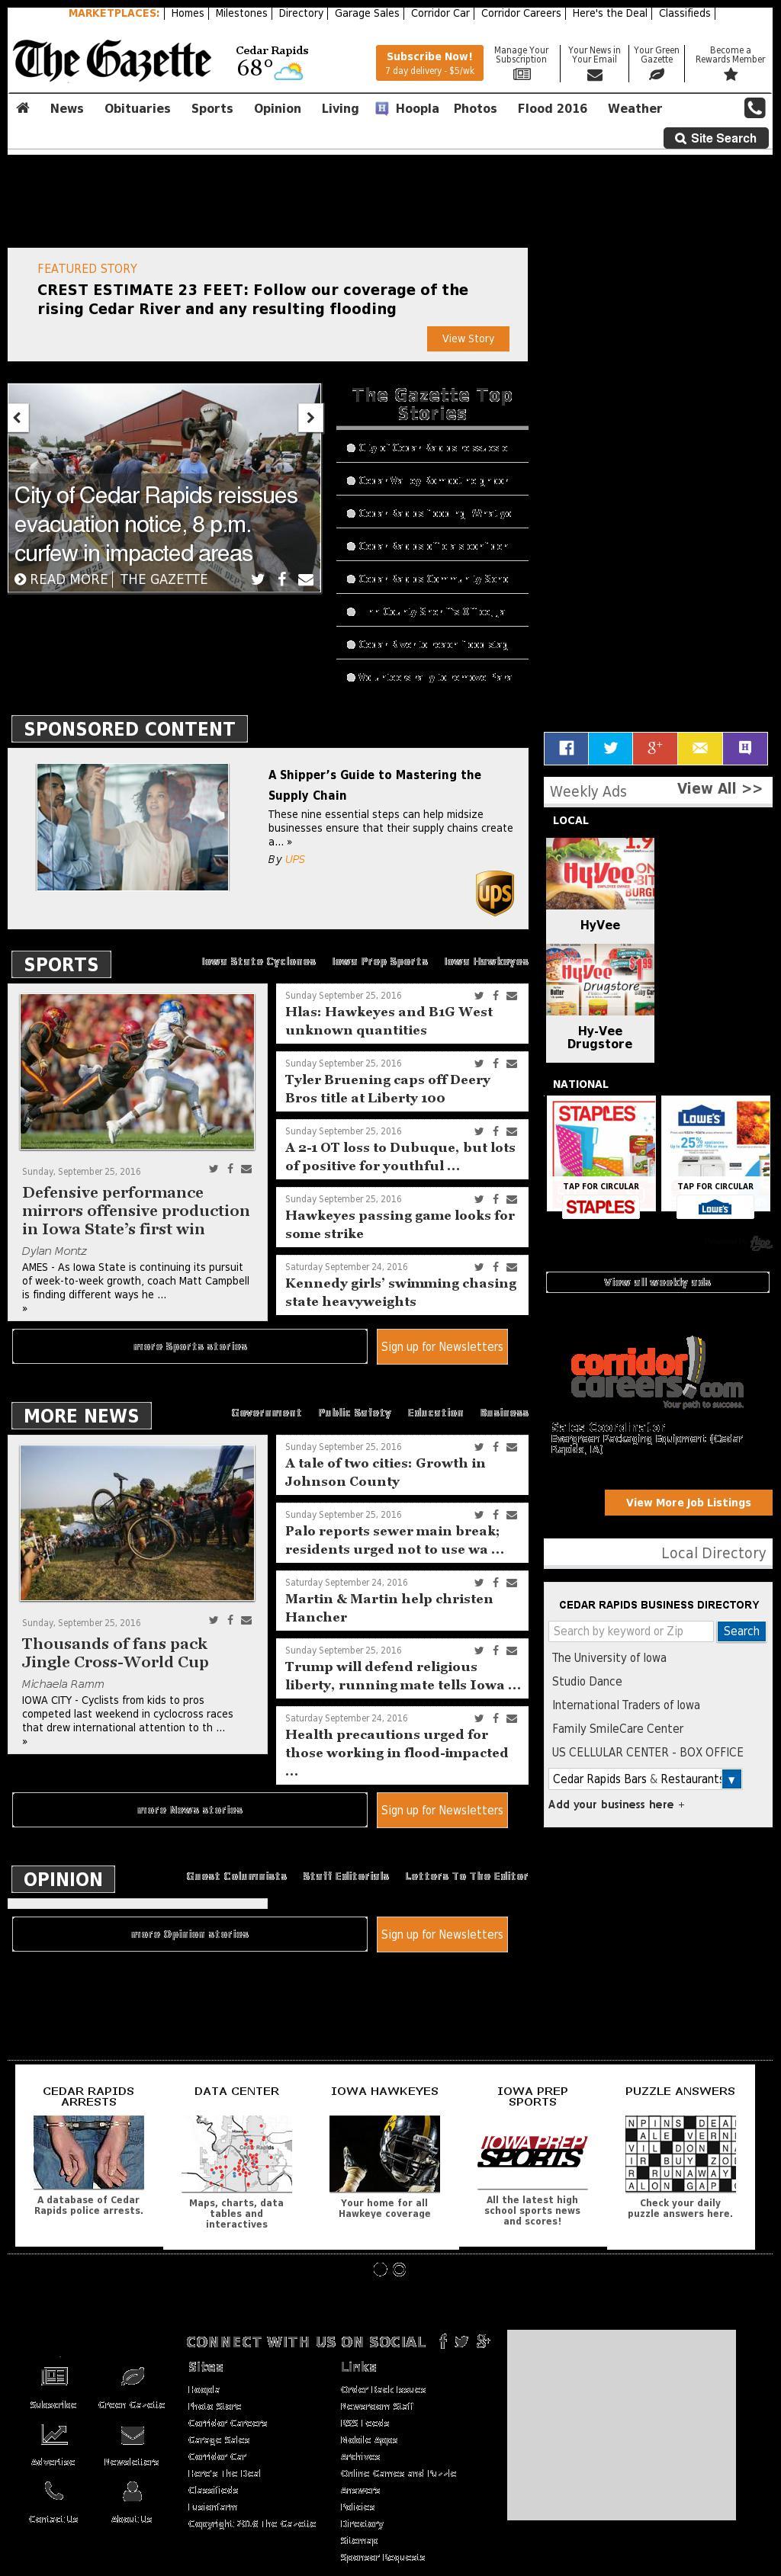 The (Cedar Rapids) Gazette at Sunday Sept. 25, 2016, 11:06 p.m. UTC